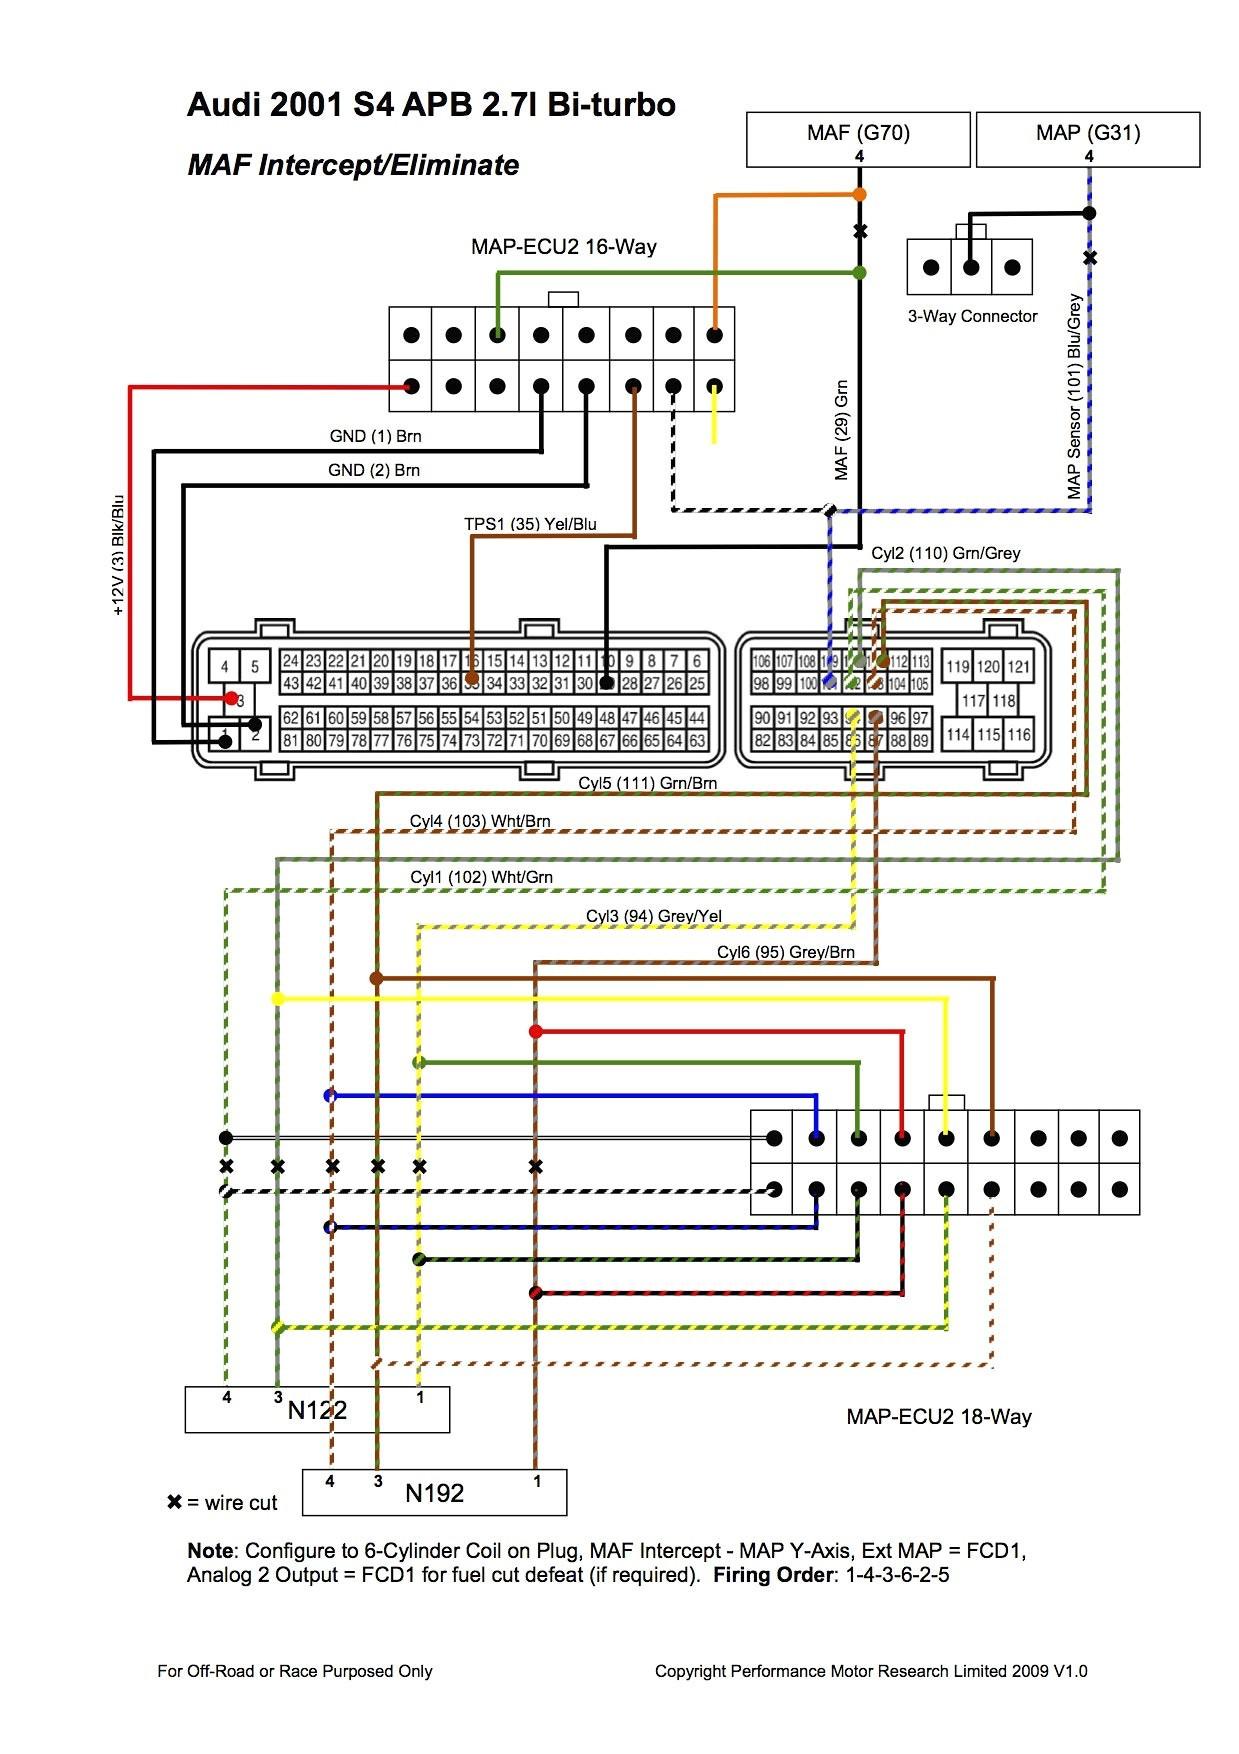 2002 nissan sentra wiring diagram phone socket australia 2006 engine my